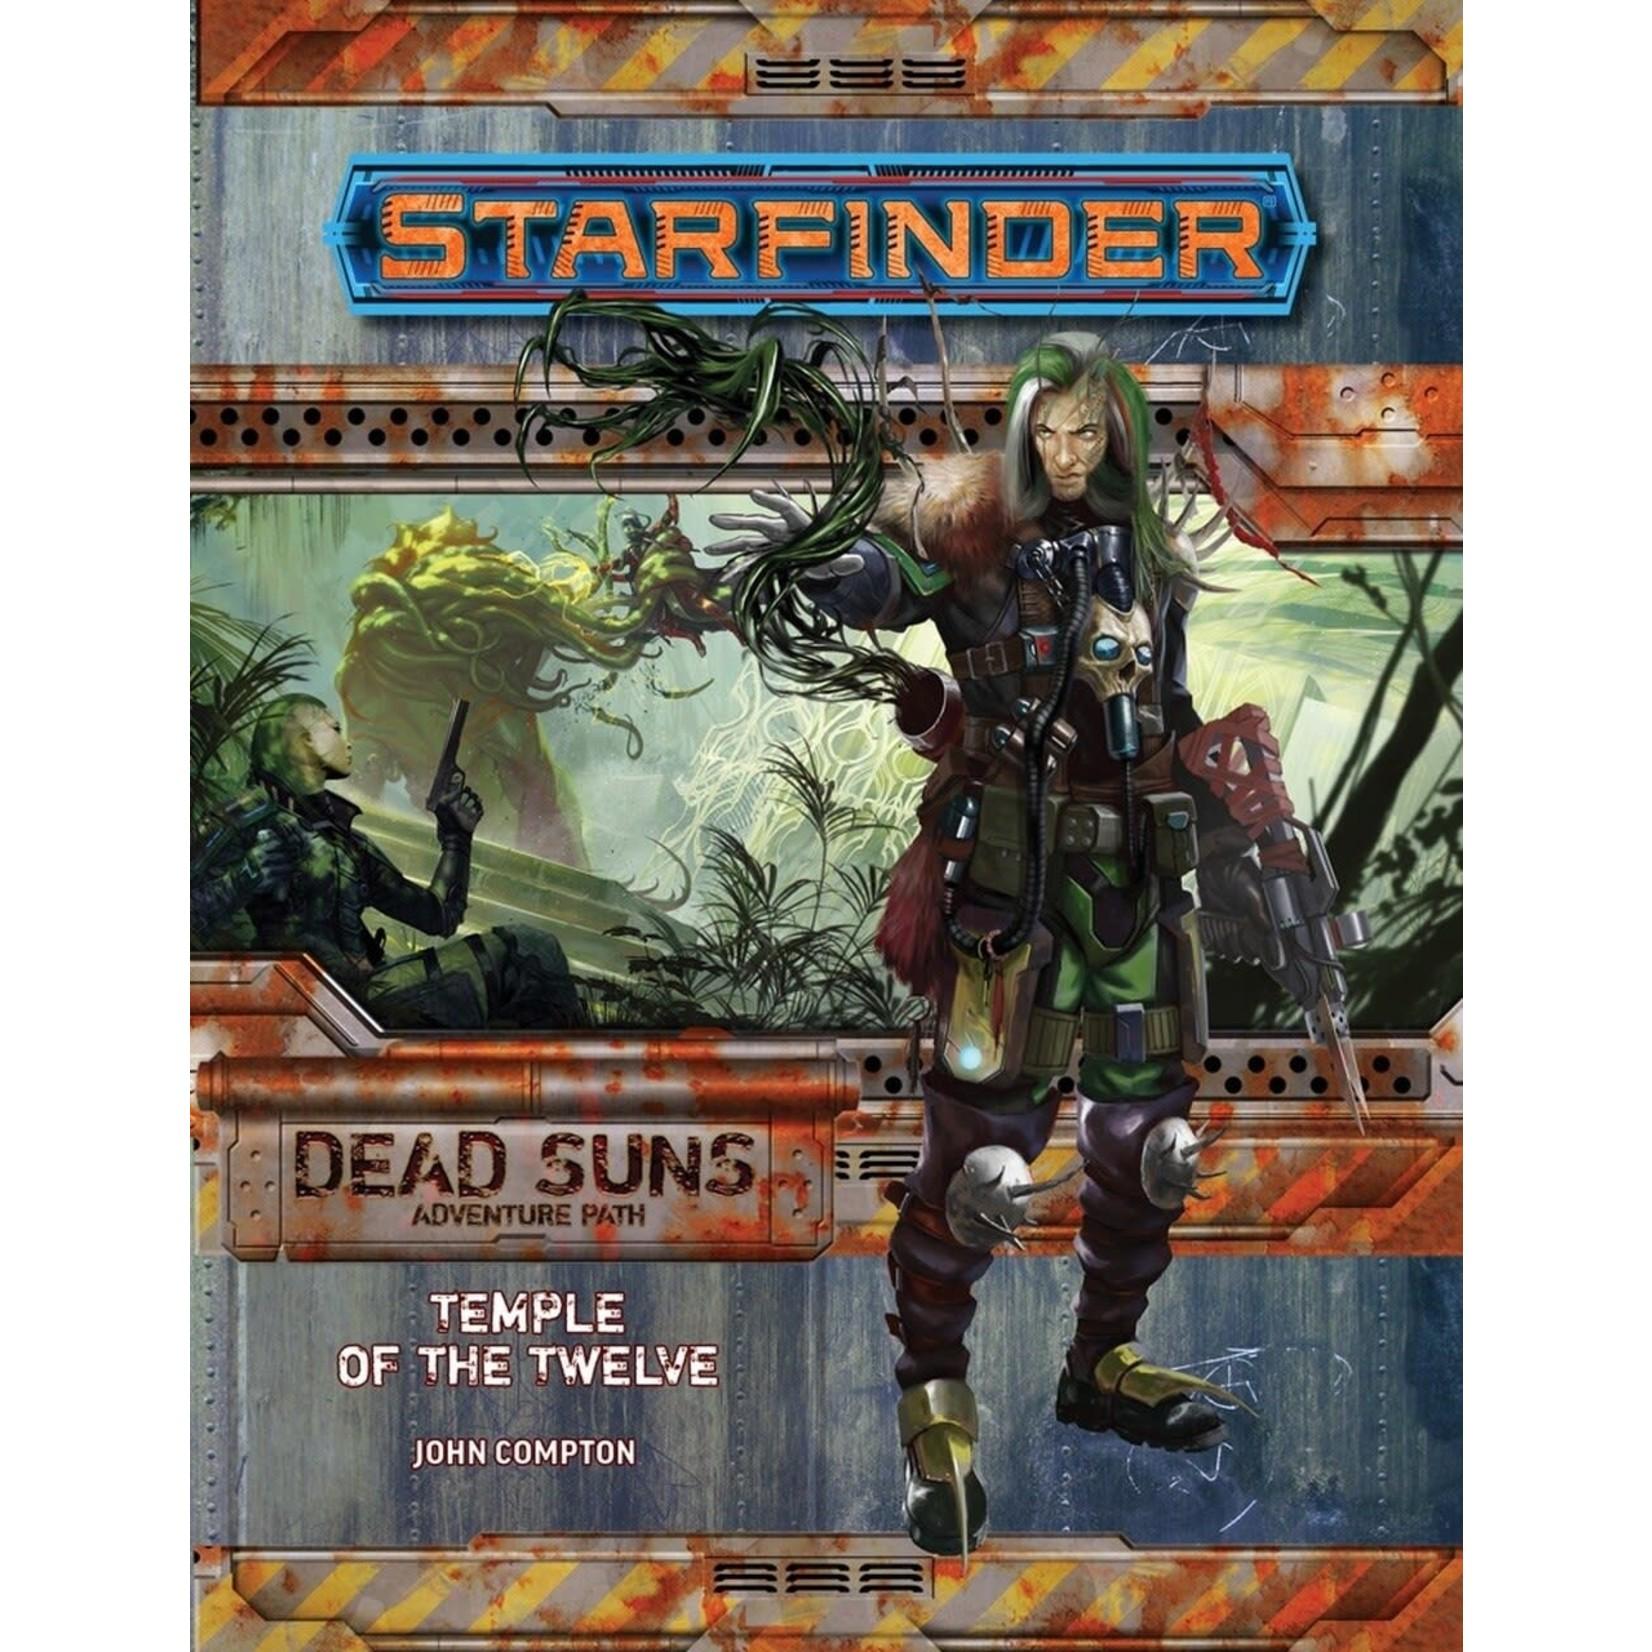 Starfinder RPG Adventure Path: Dead Suns 2 Temple of the Twelve